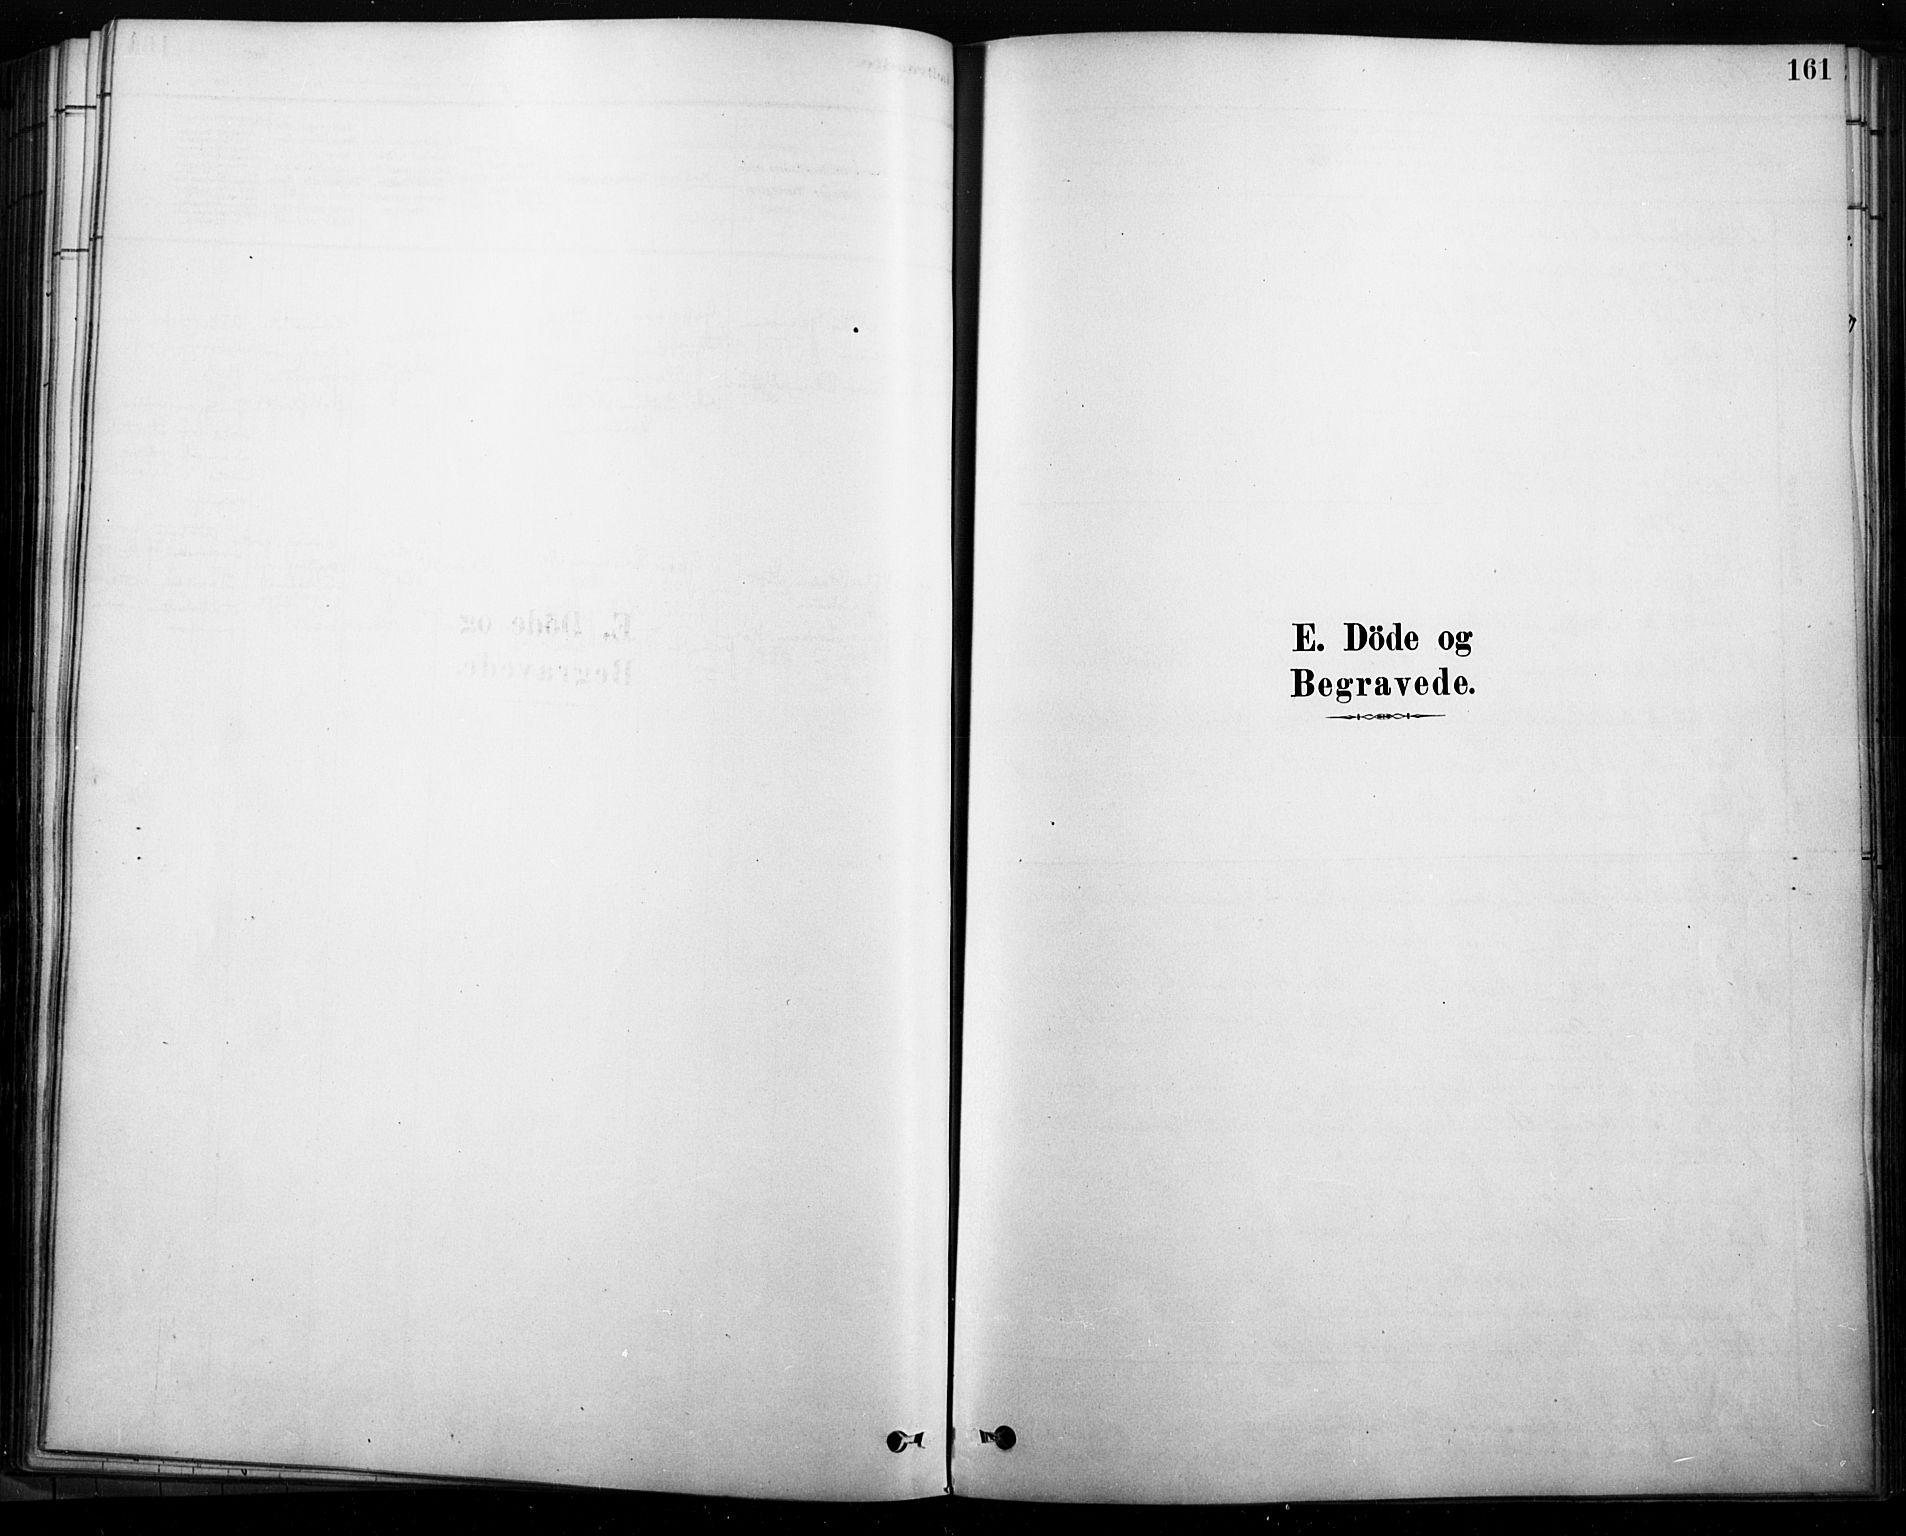 SAH, Rendalen prestekontor, H/Ha/Haa/L0009: Ministerialbok nr. 9, 1878-1901, s. 161